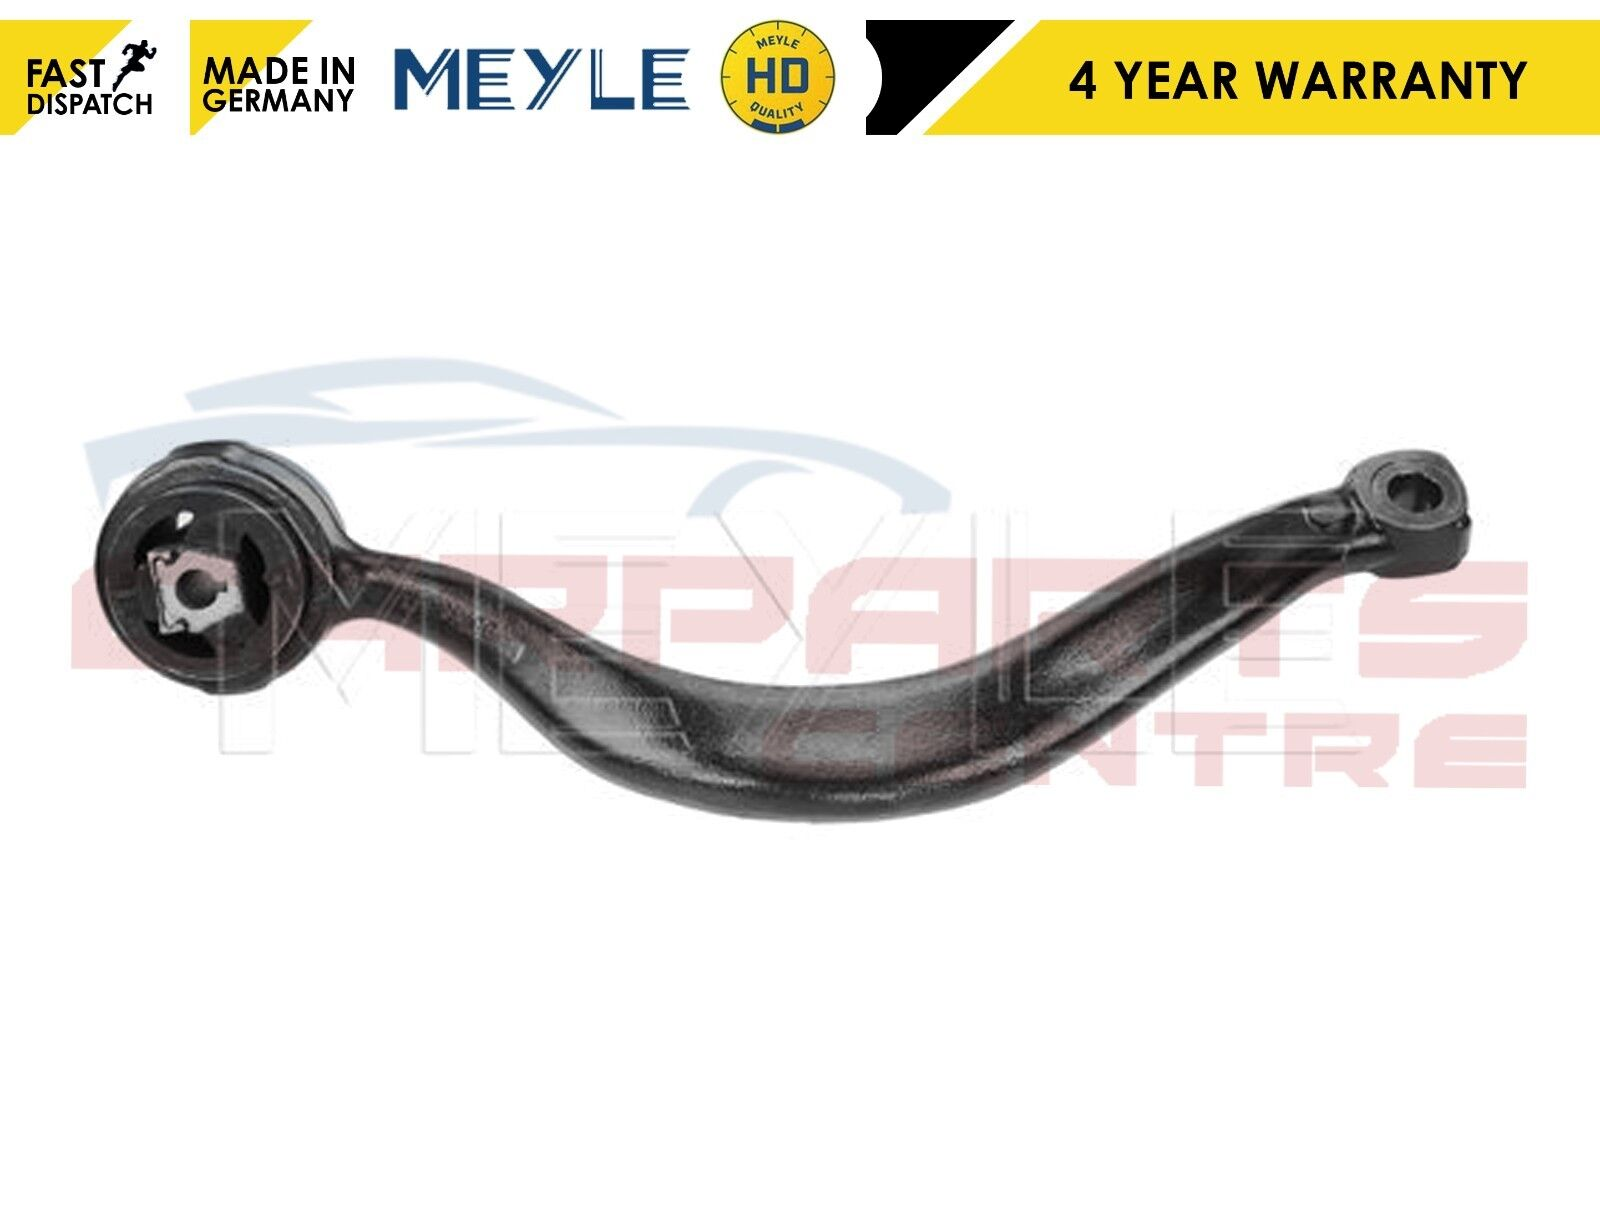 Meyle HD FRONT Right Forward Arm Track Control Arm No 316 050 0008//HD